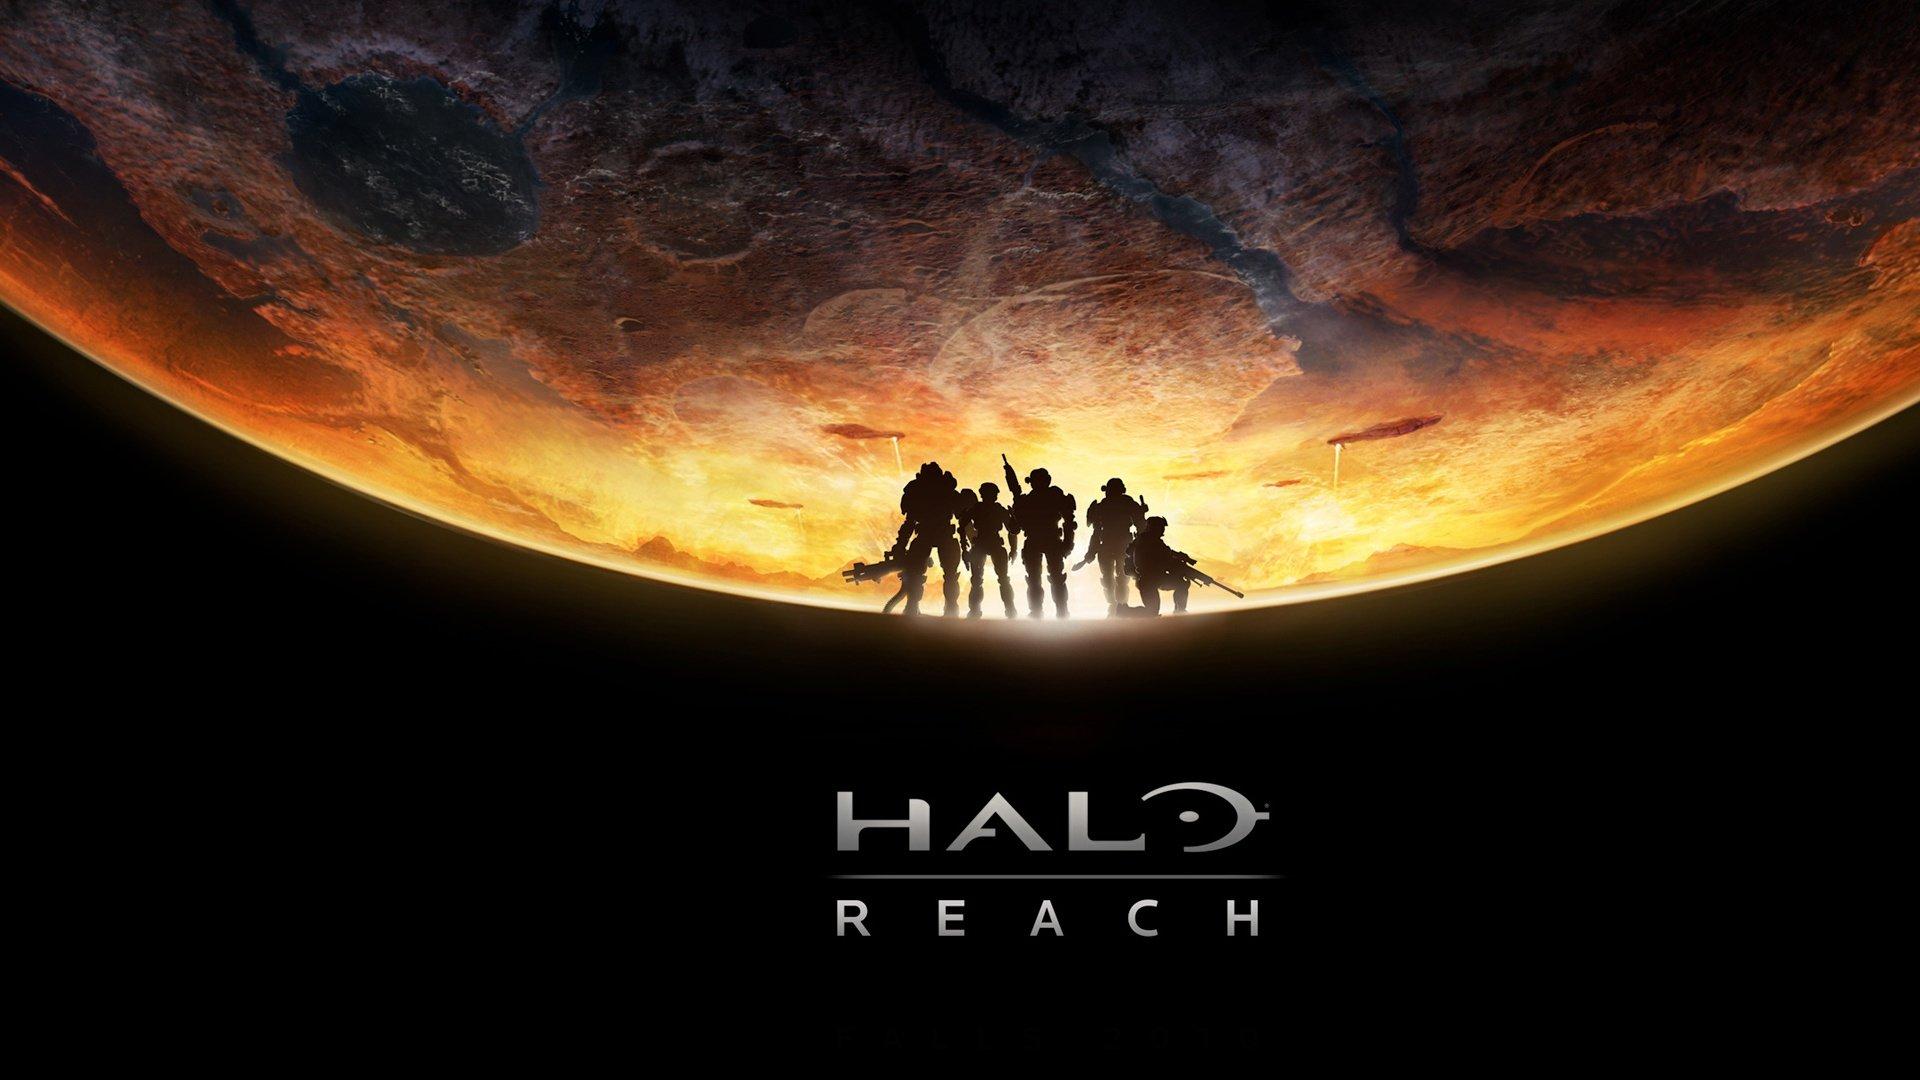 Halo: Reach wallpapers 1920x1080 Full HD (1080p) desktop ...